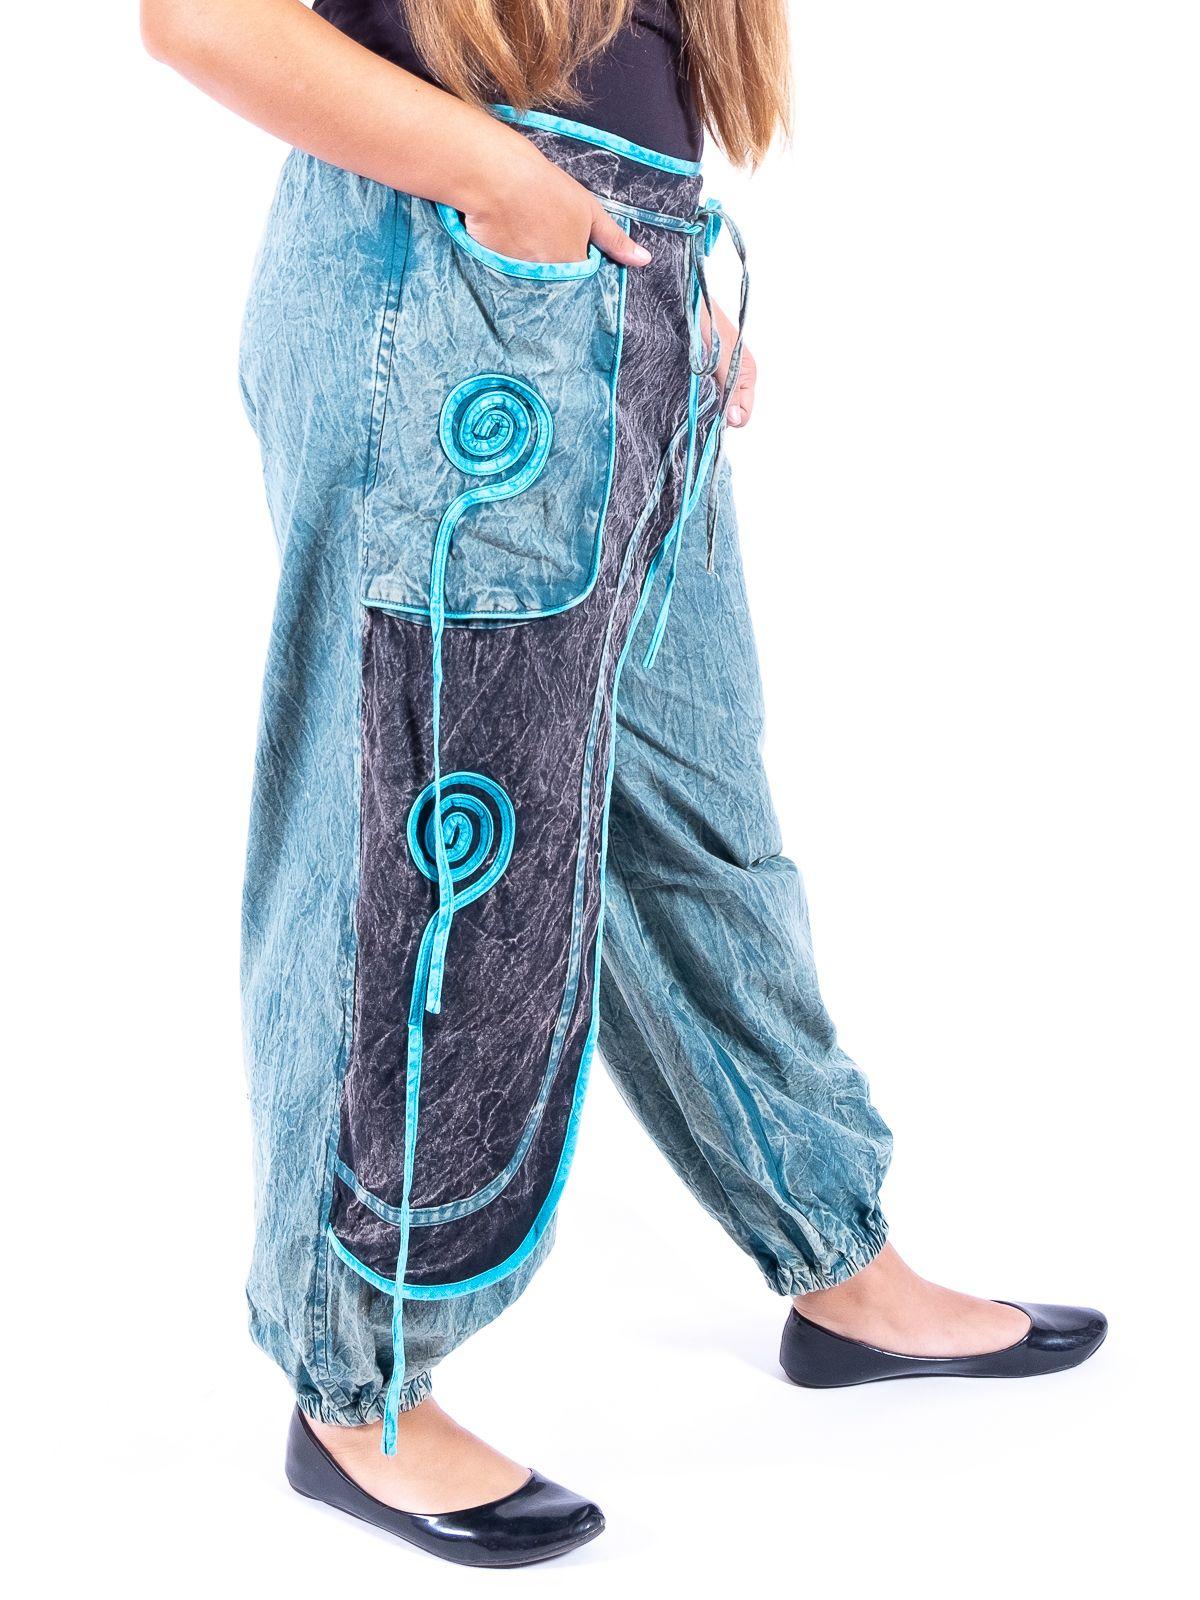 Kalhoty HOPE z Nepálu - NT0053-39-001 KENAVI